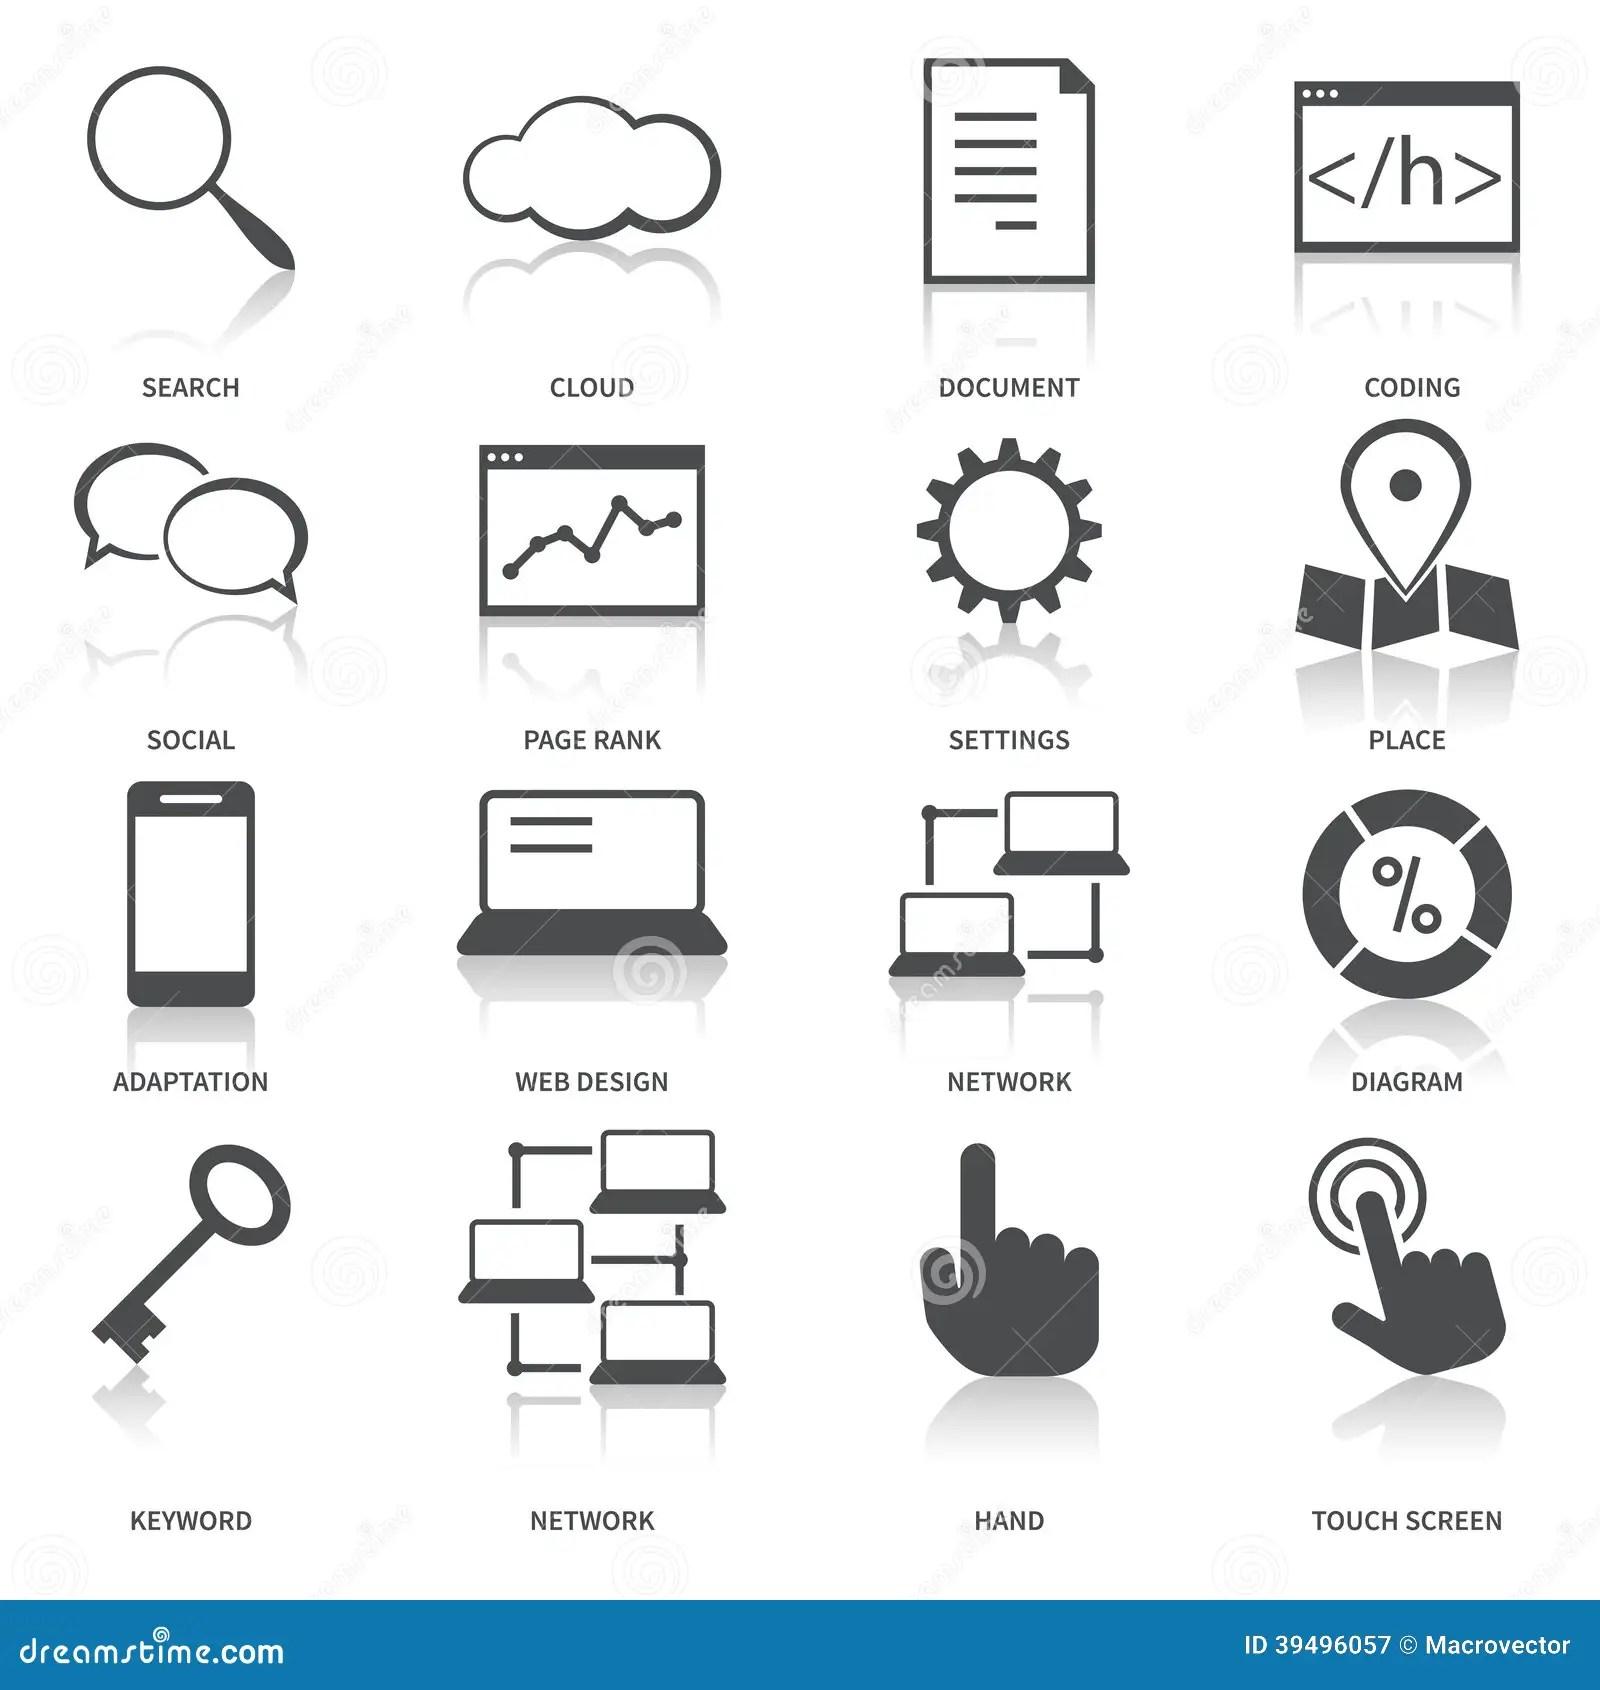 Icones Da Otimizacao Do Search Engine Ajustados Ilustracao